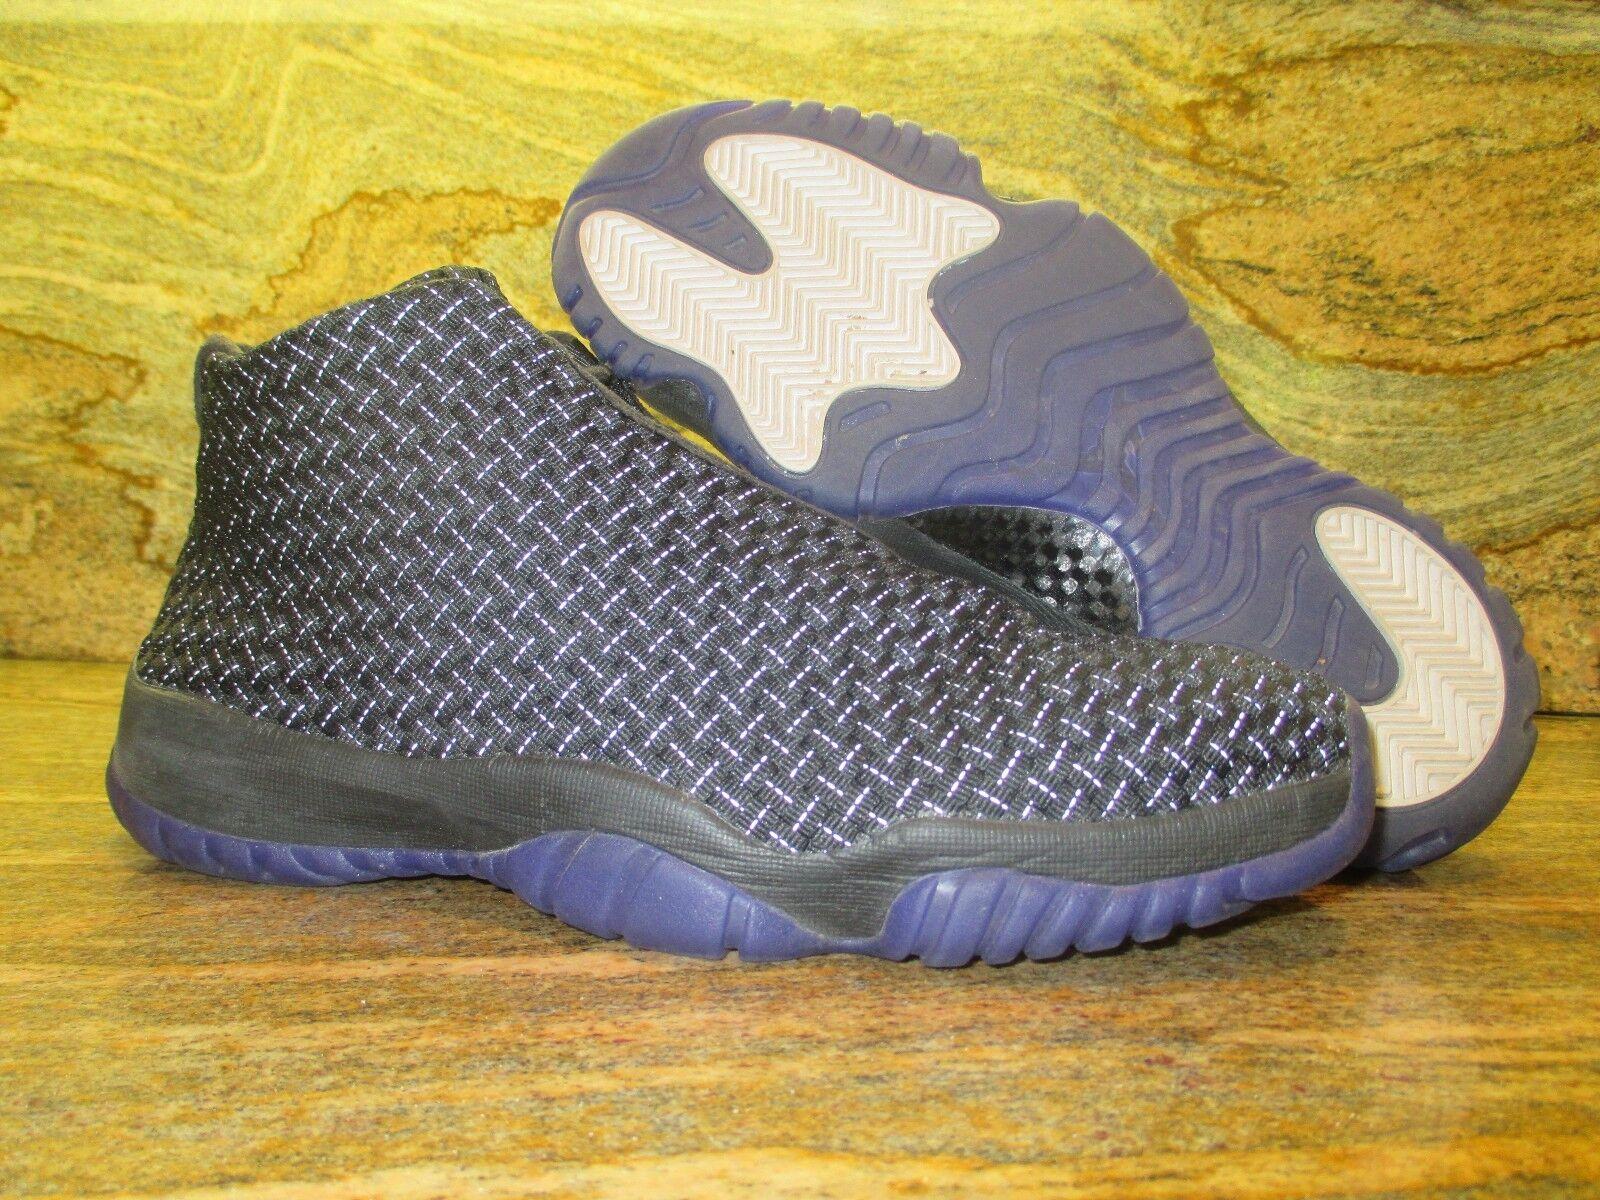 Nike 9 Air Jordan Avenir Premium Inédit Échantillon Sz 9 Nike Rétro 11 Pinnacle Concord 048157